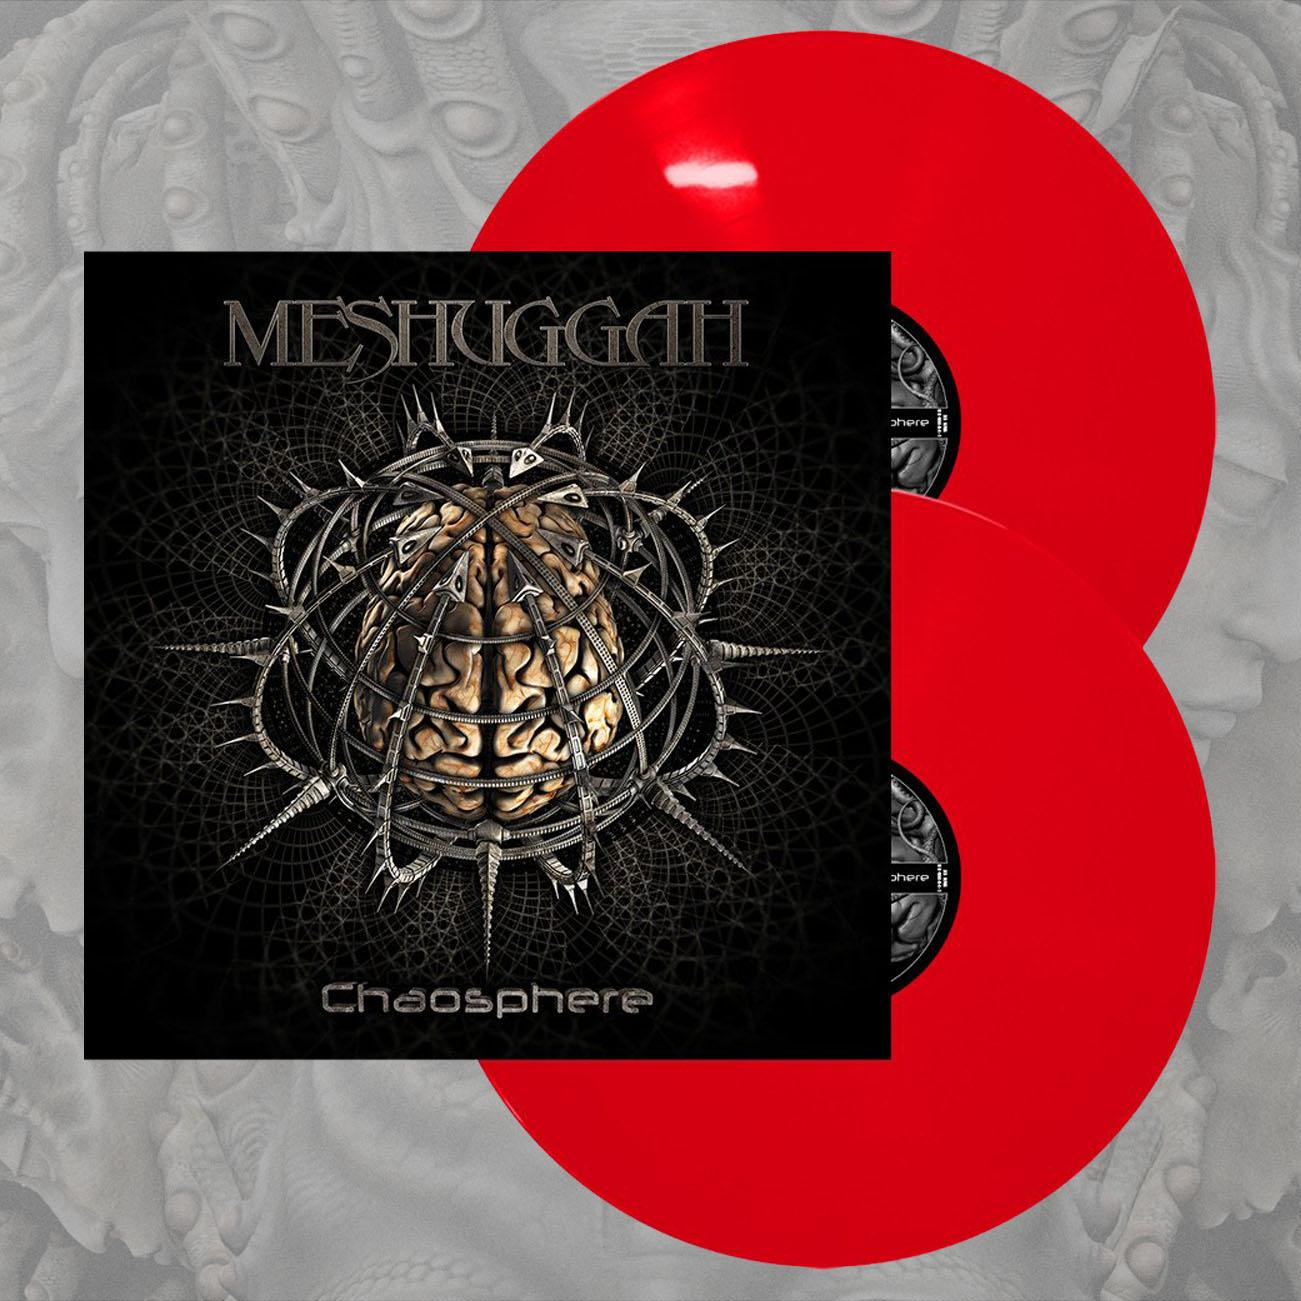 Meshuggah - 'Chaosphere' Red 2LP - Meshuggah